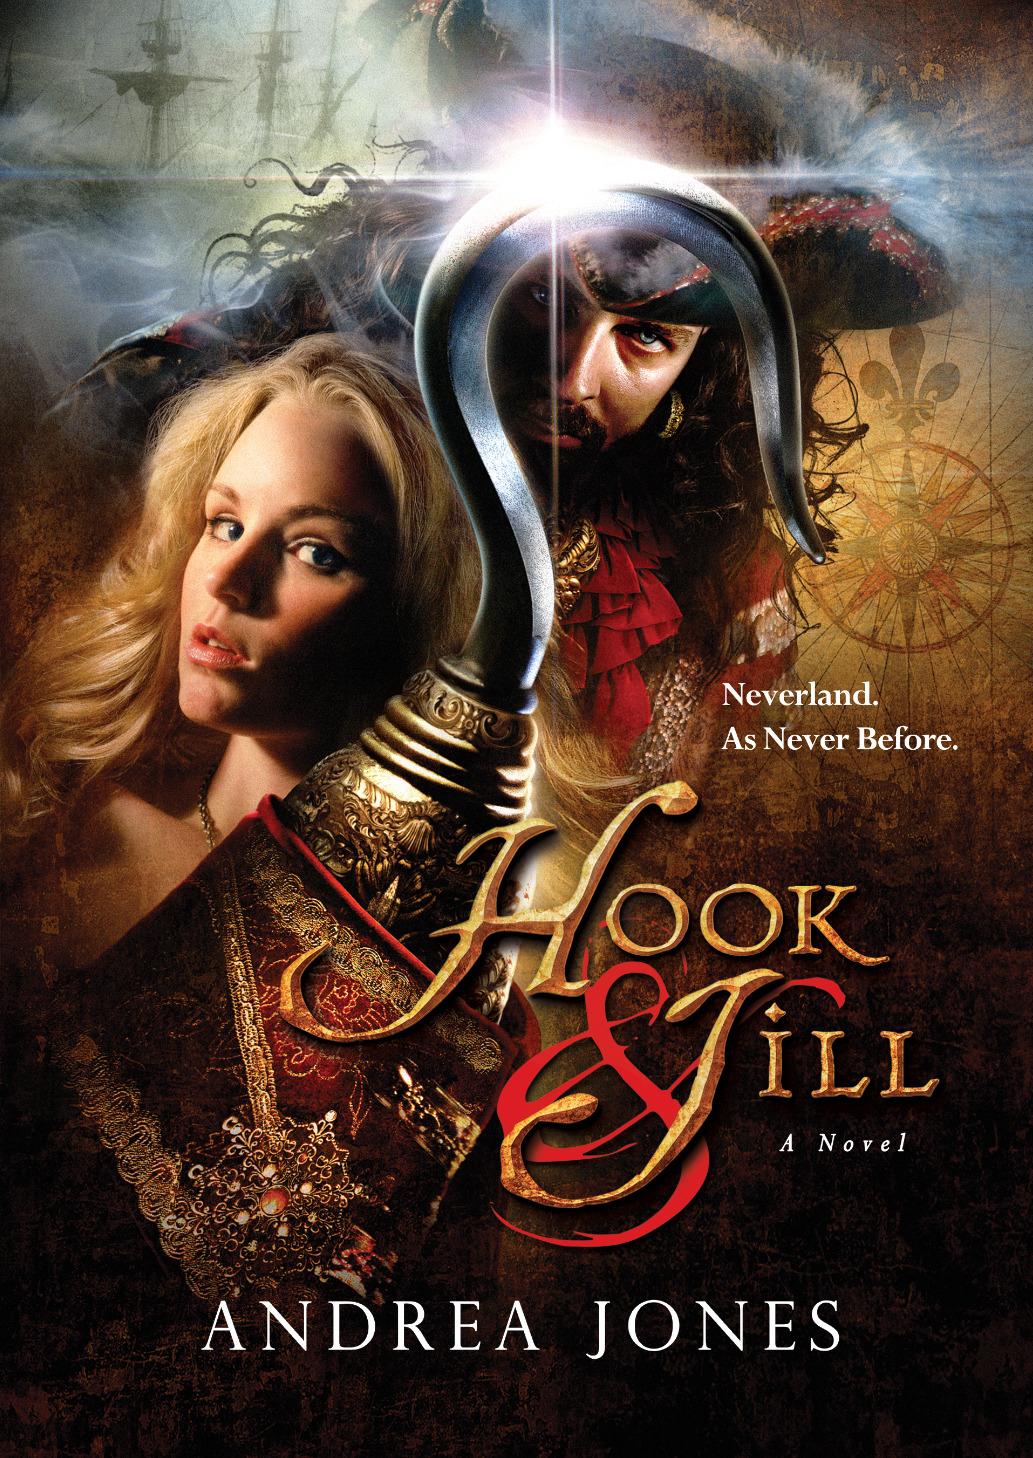 Hook jill flat cover